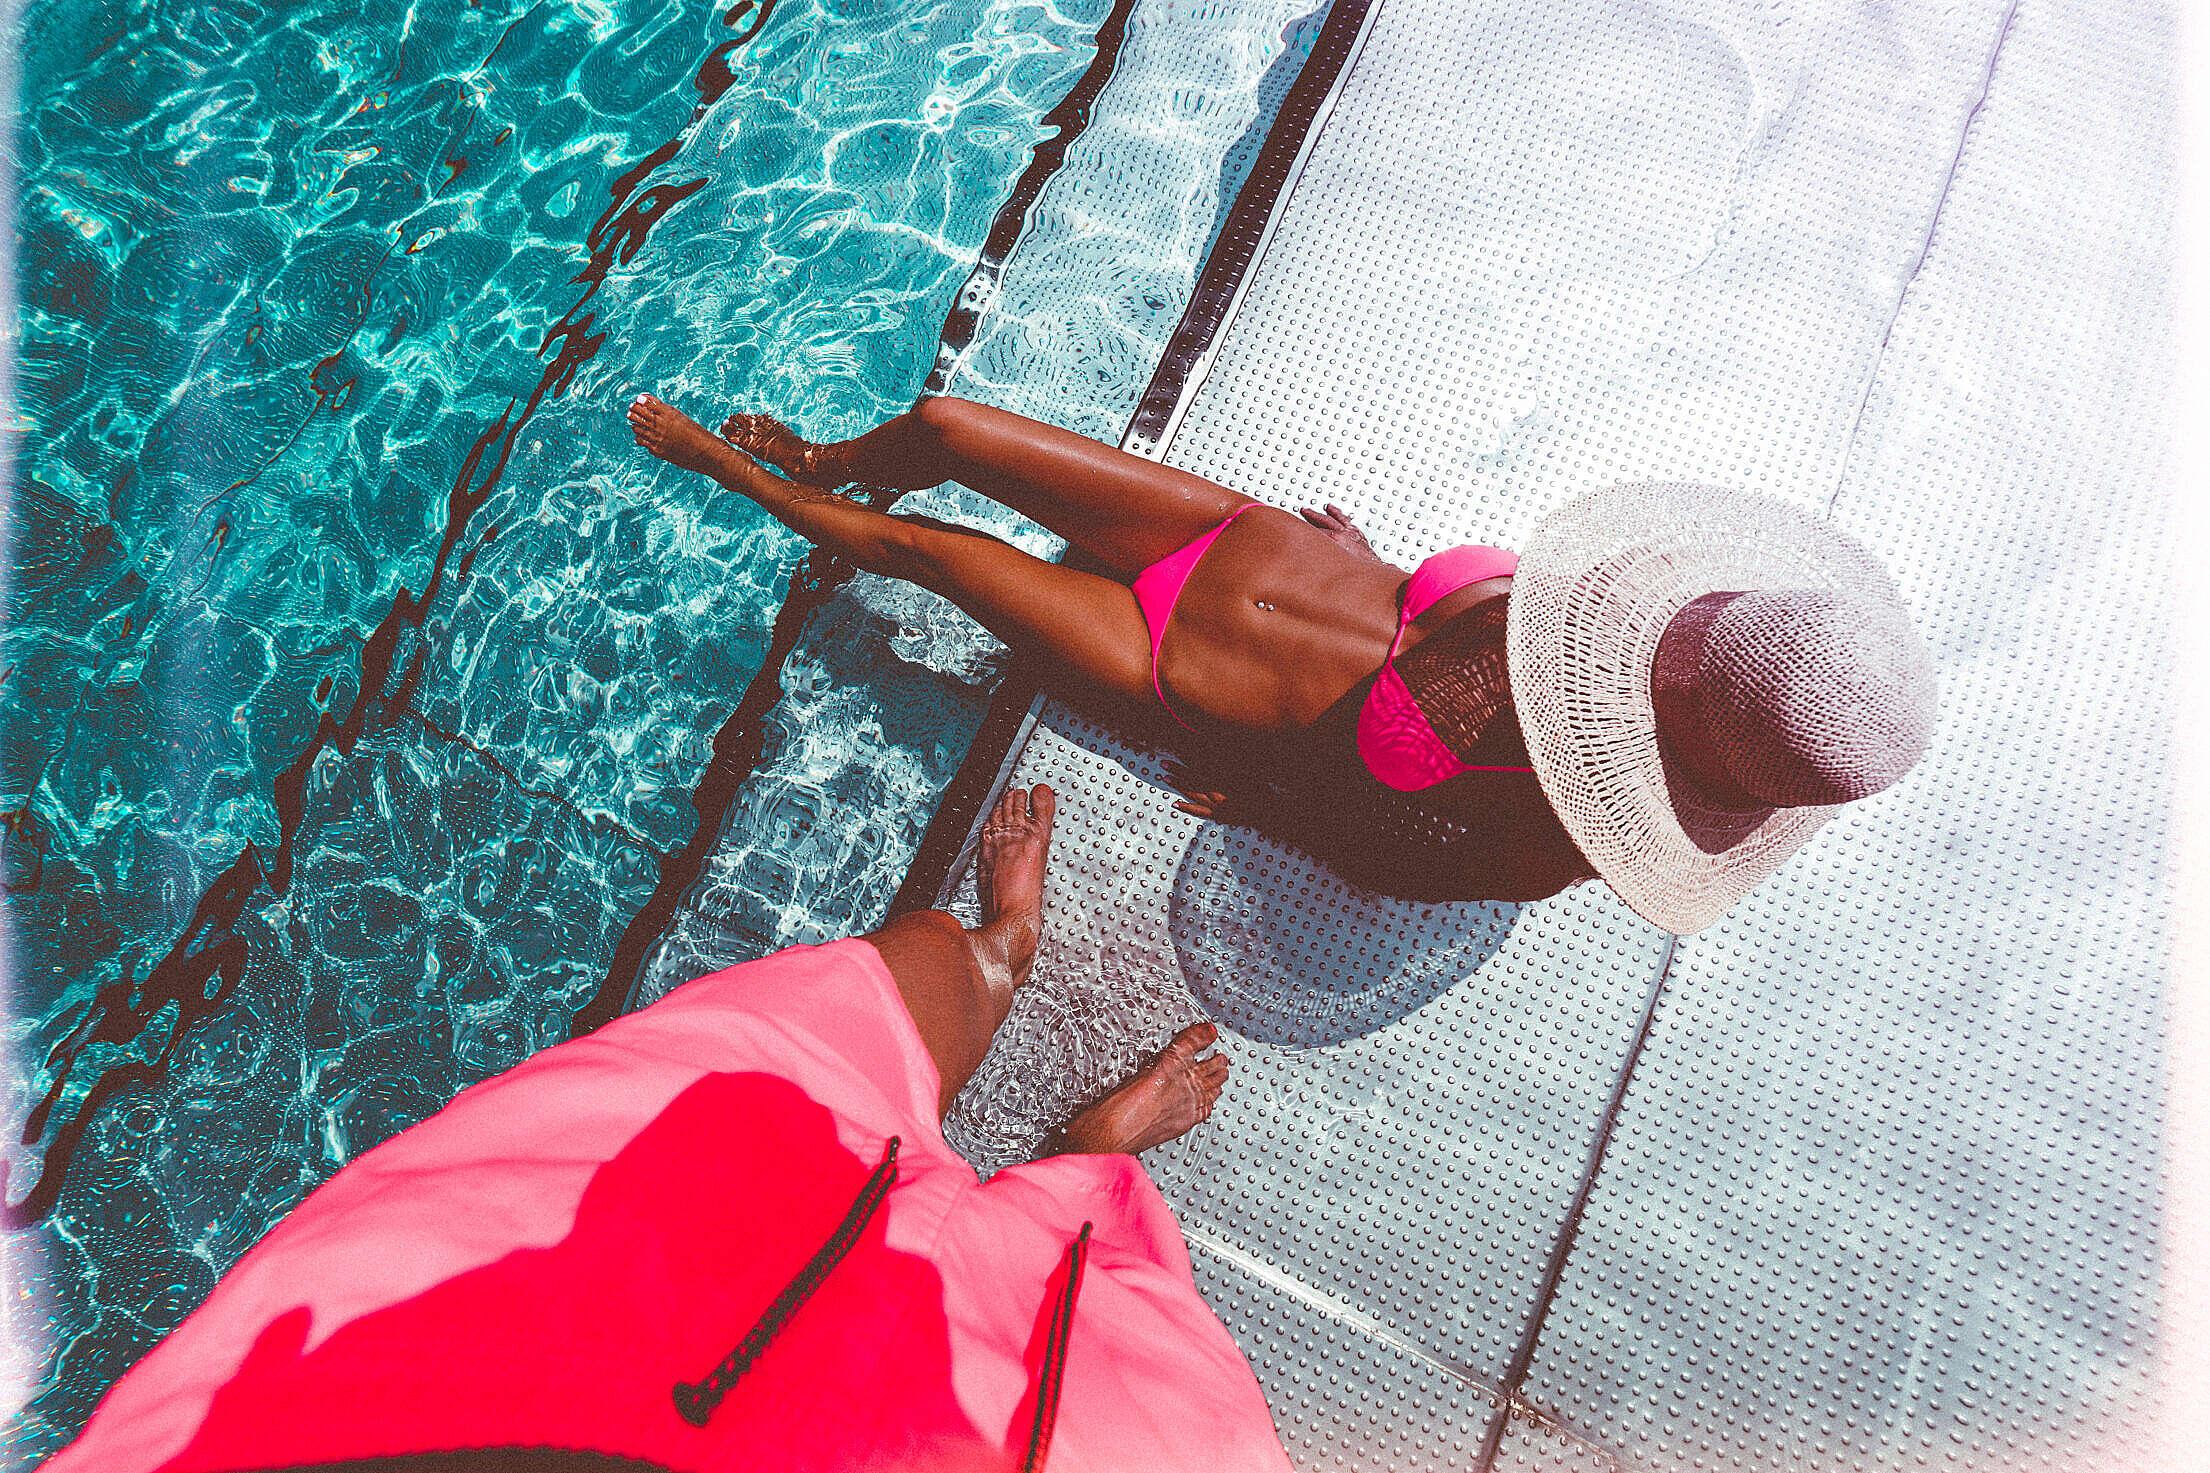 Man Looking at His Sexy Fitness Wife in Bikini Free Stock Photo